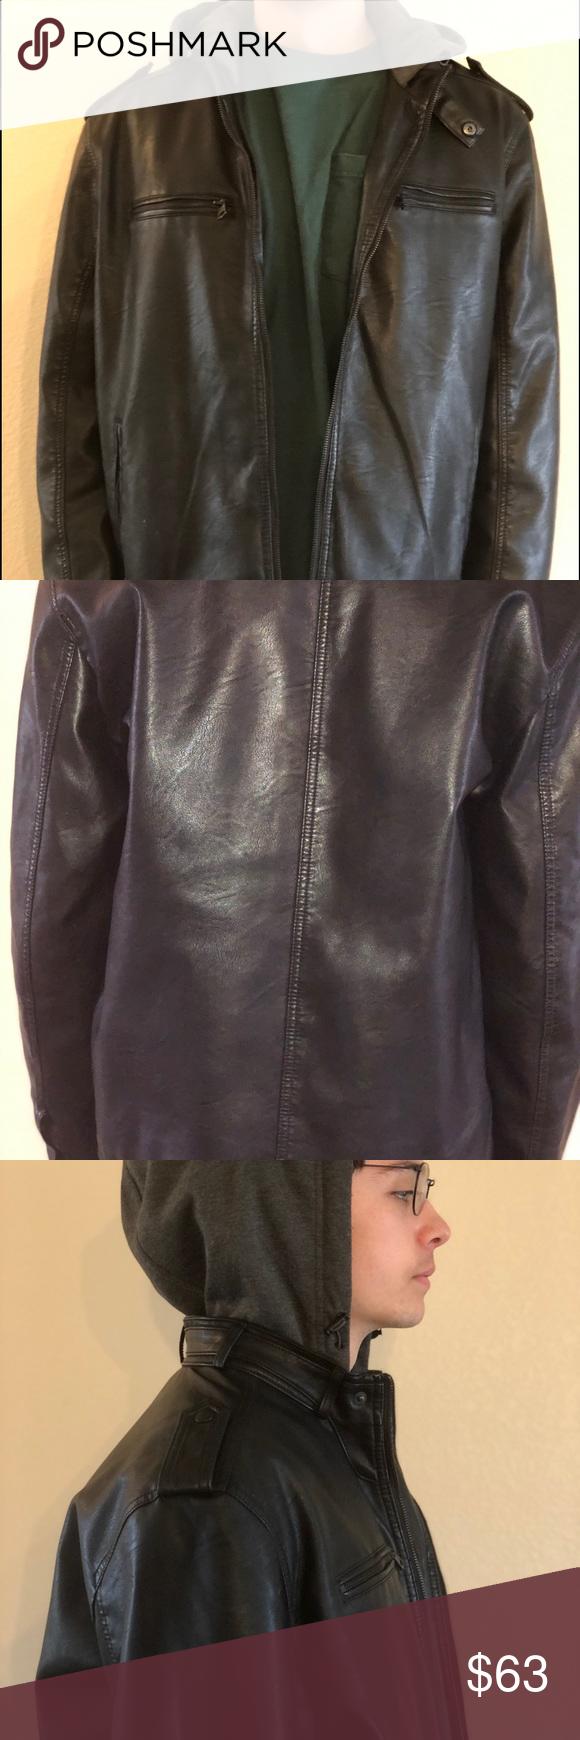 Levi S Faux Leather Hoodie Jacket Xl Black Leather Hoodie Faux Leather Hoodie Hoodie Jacket [ 1740 x 580 Pixel ]